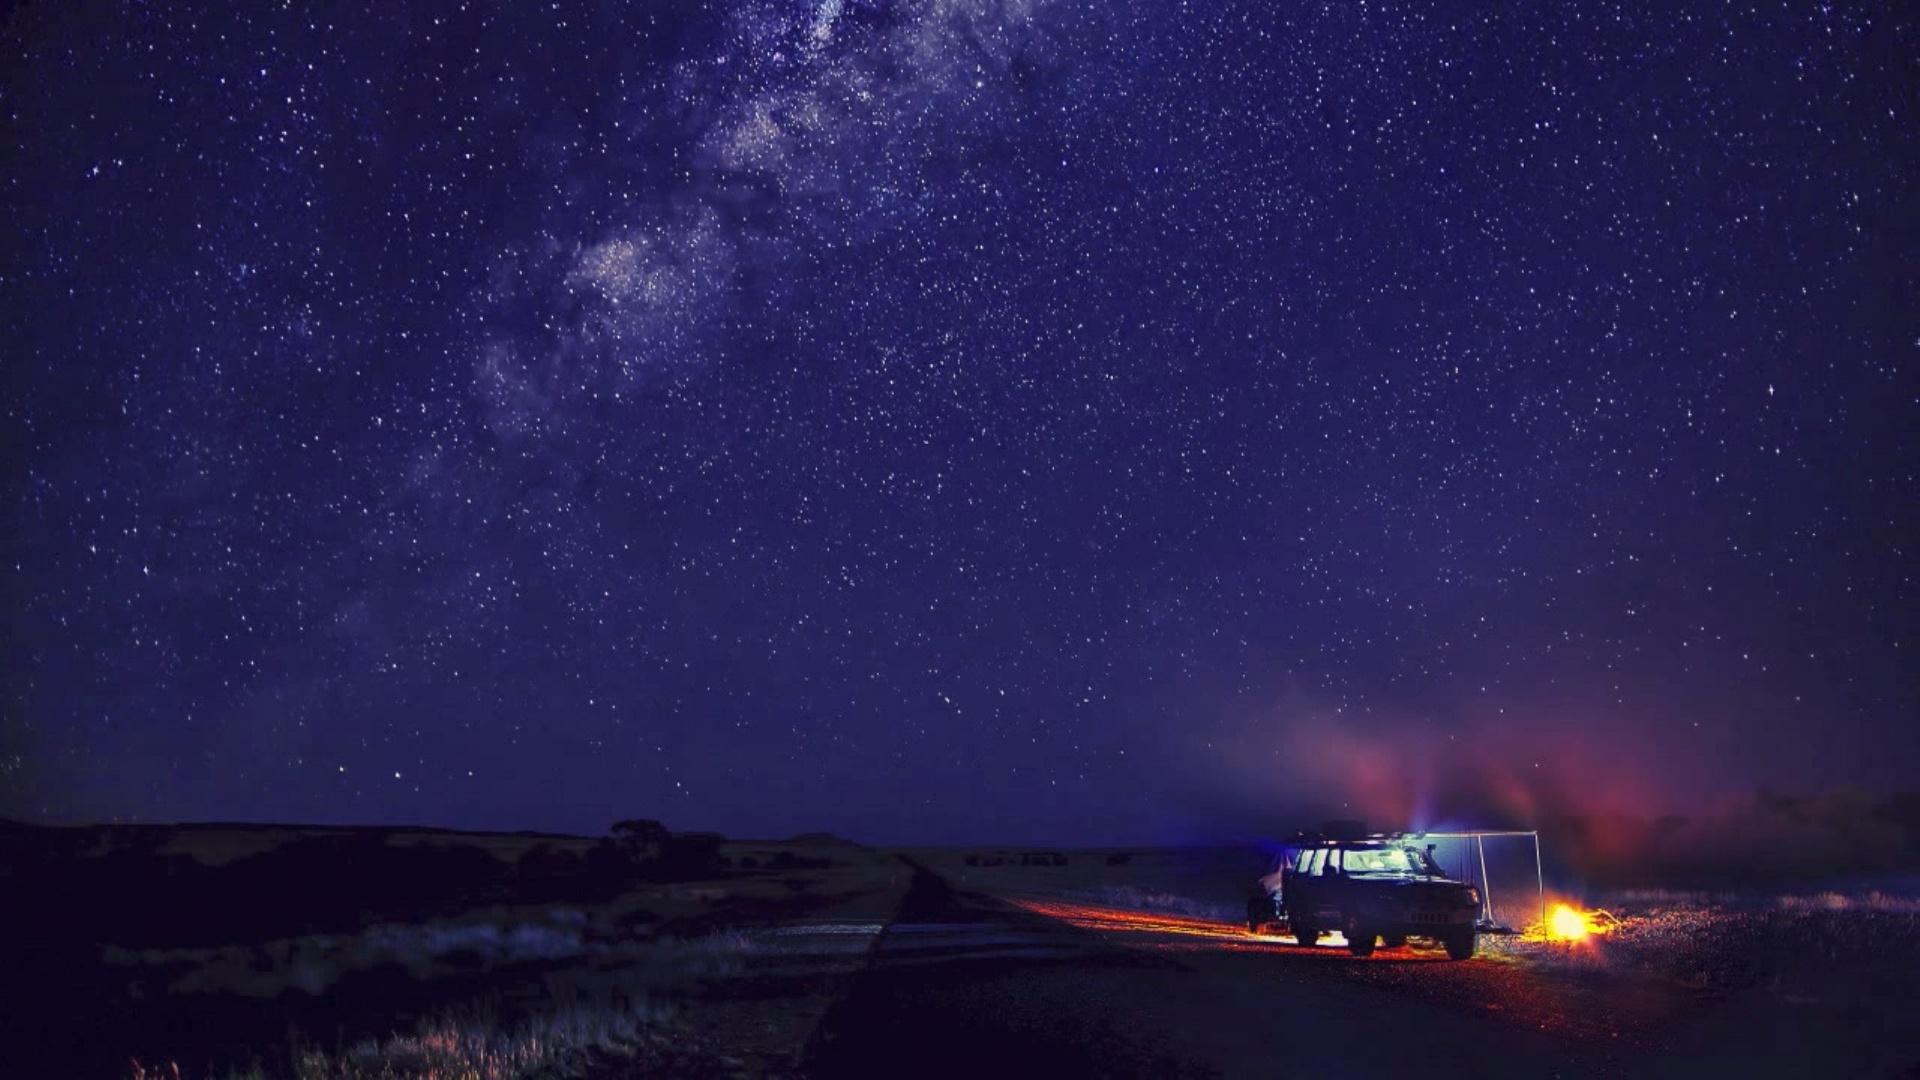 starry night sky wallpaper   wallpapersafari